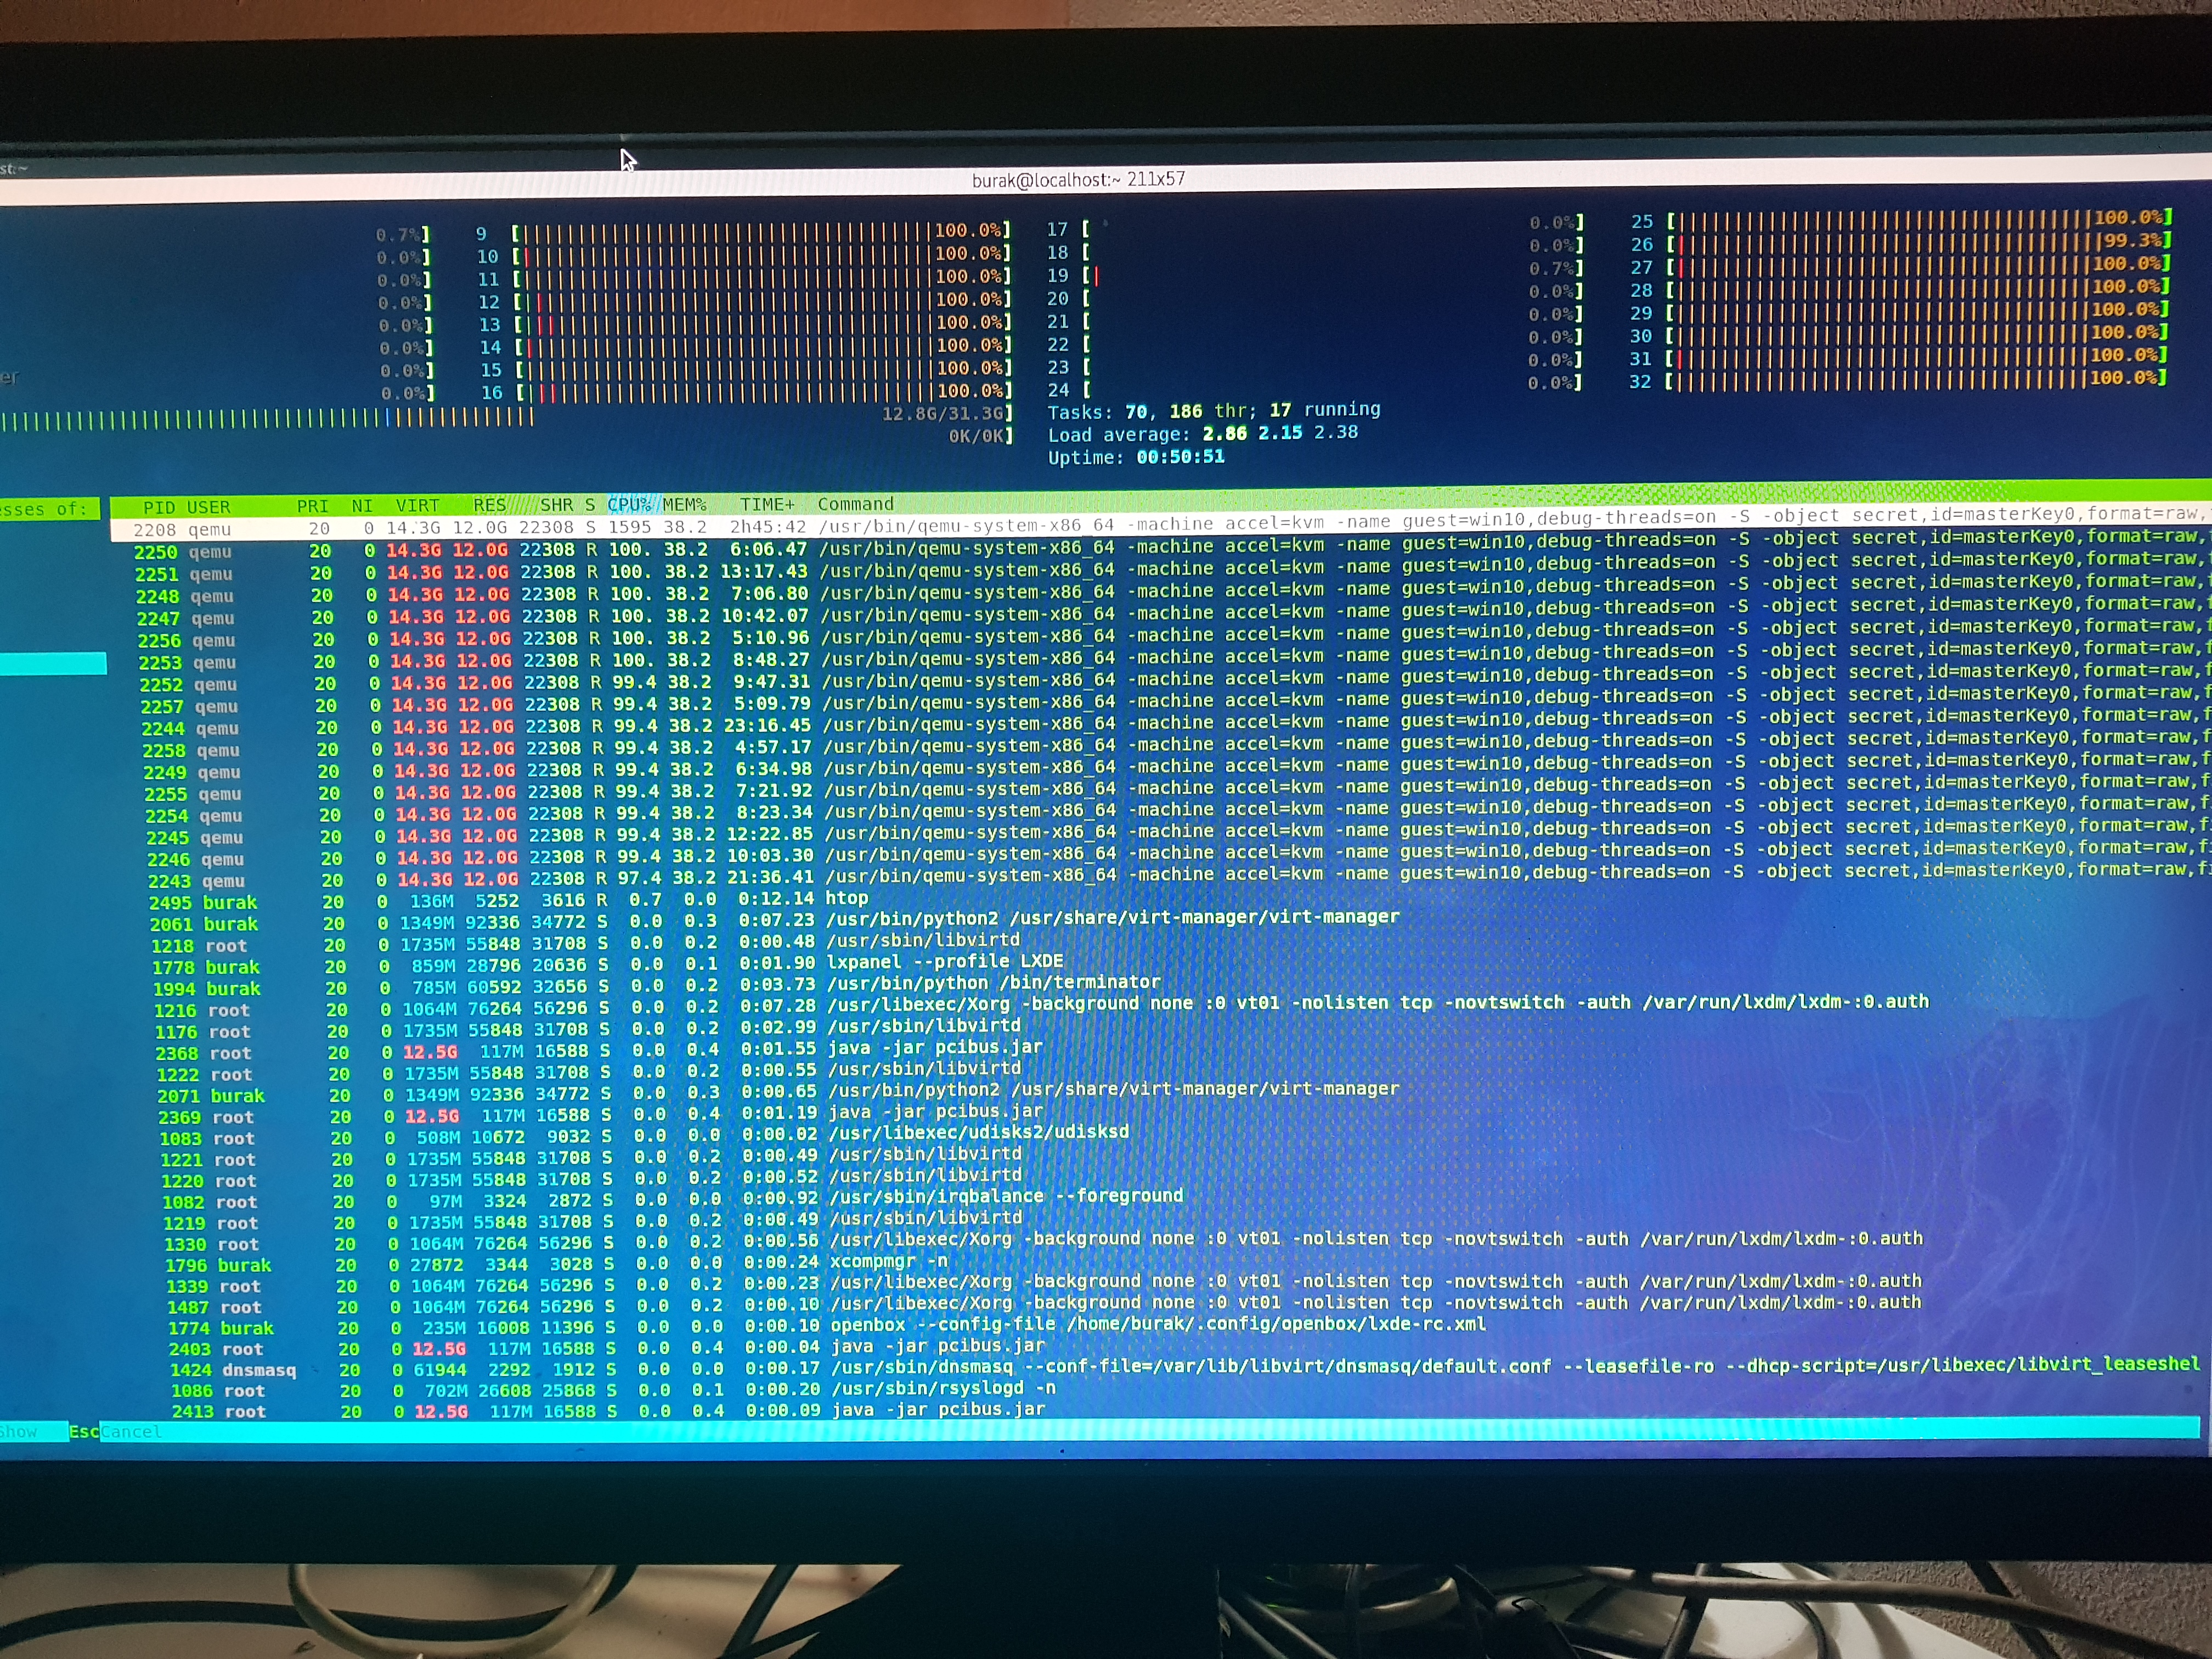 Thanks Level1! Threadripper PCI Passthrough works smooth